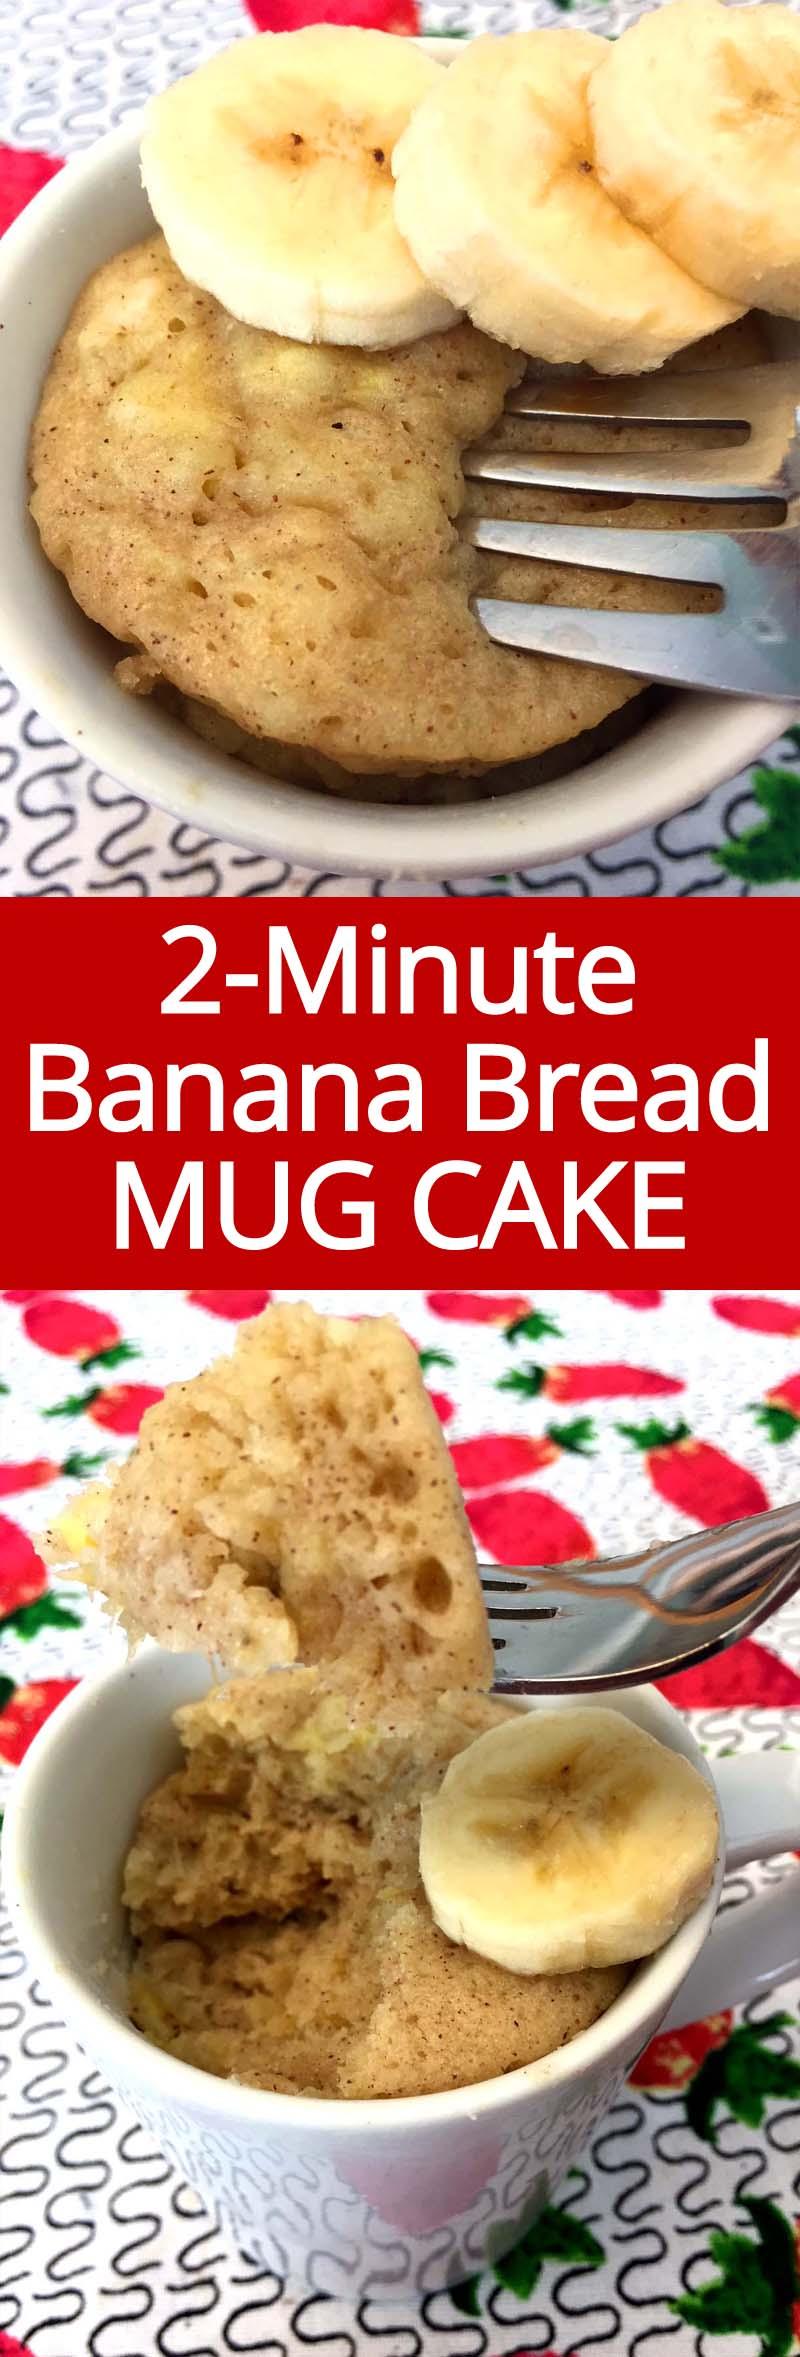 Banana Mug Cake Microwave